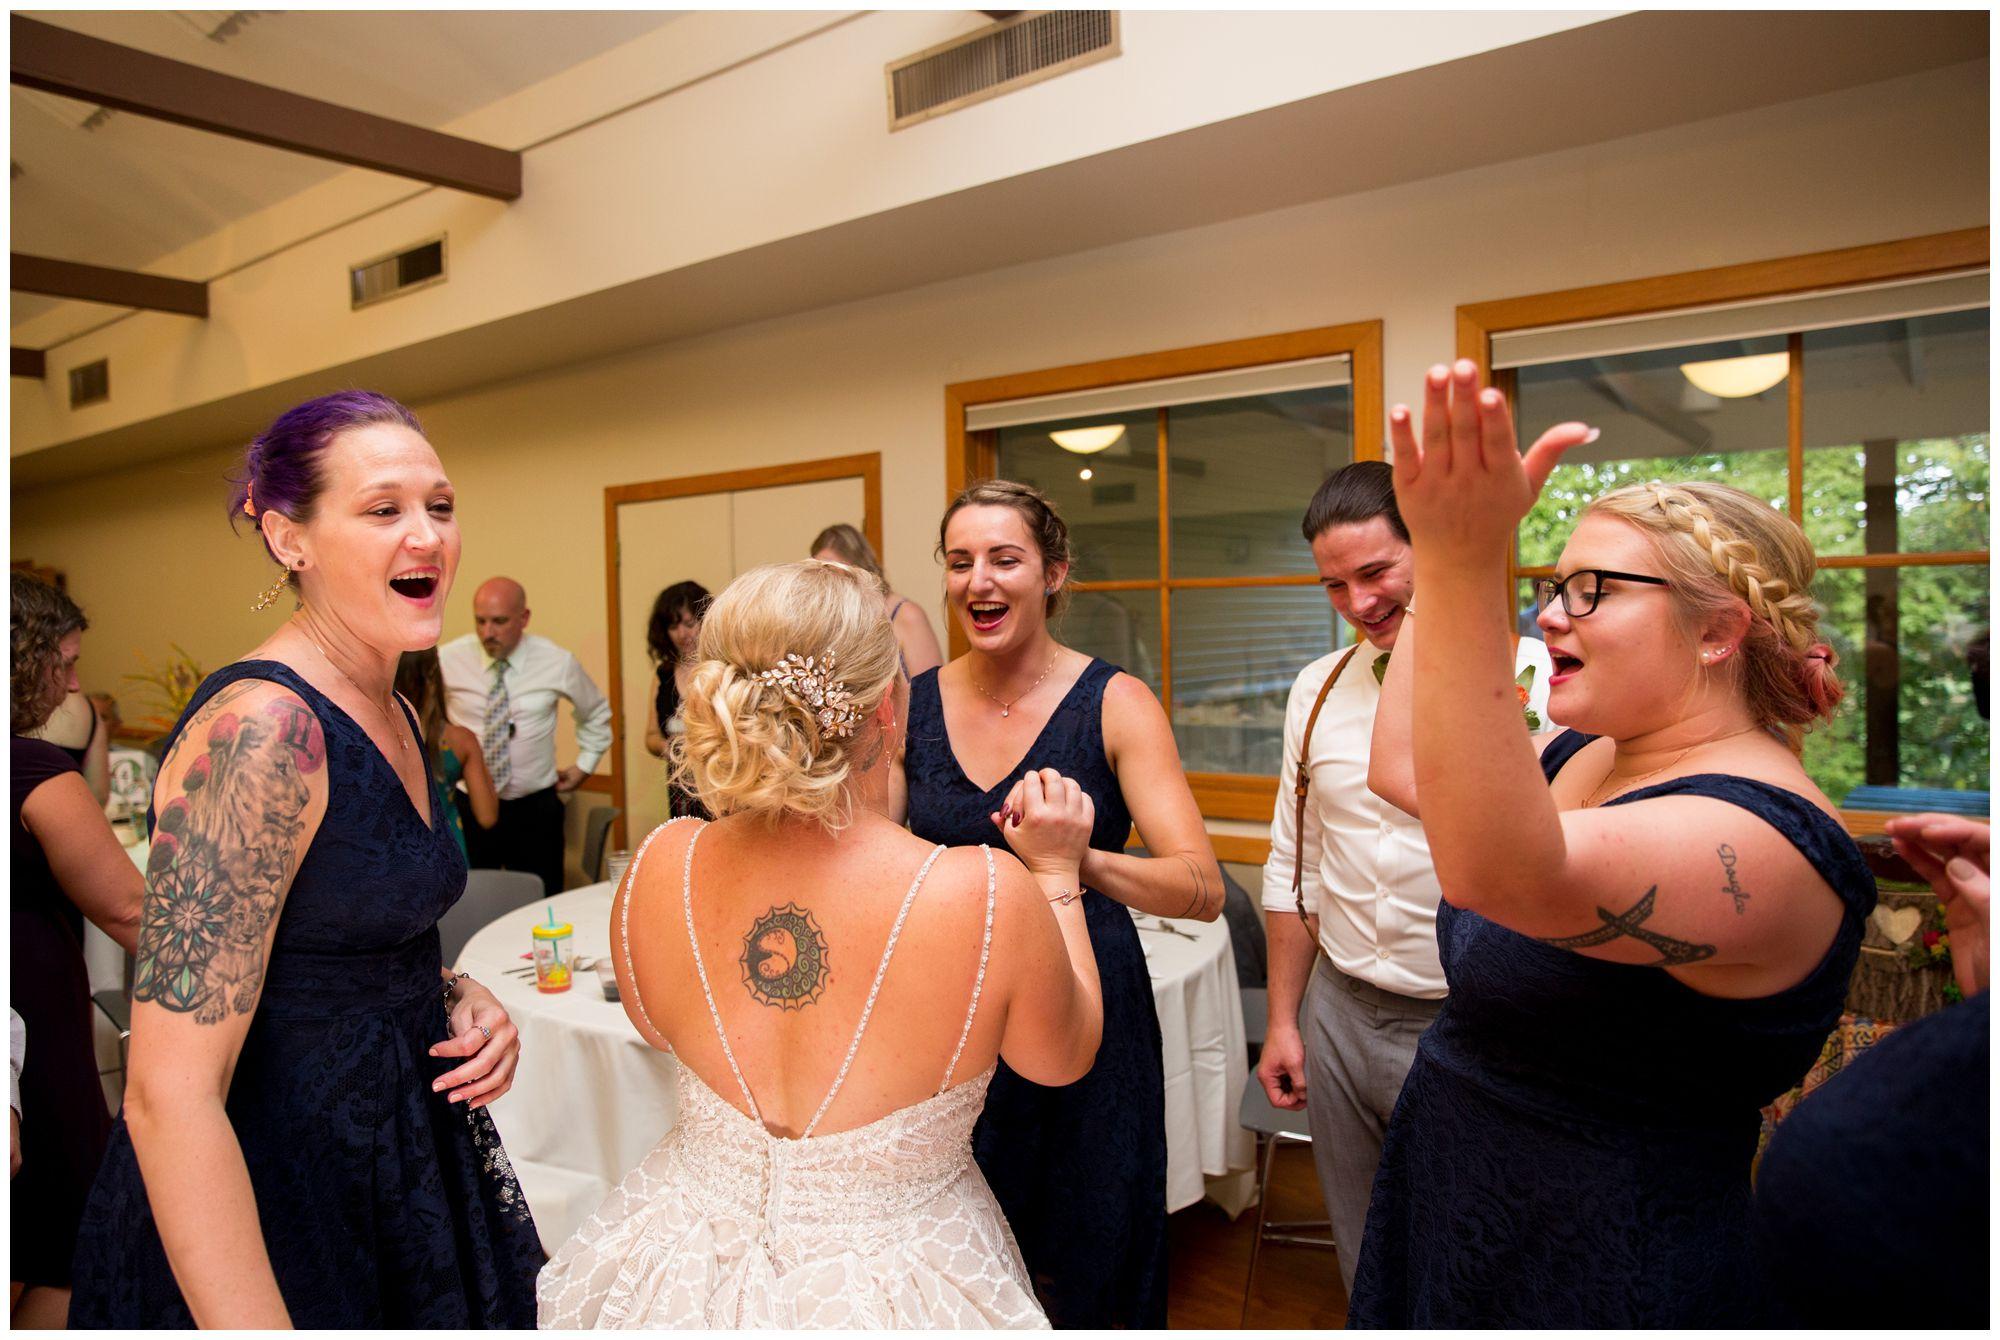 Forest Park Inn wedding reception